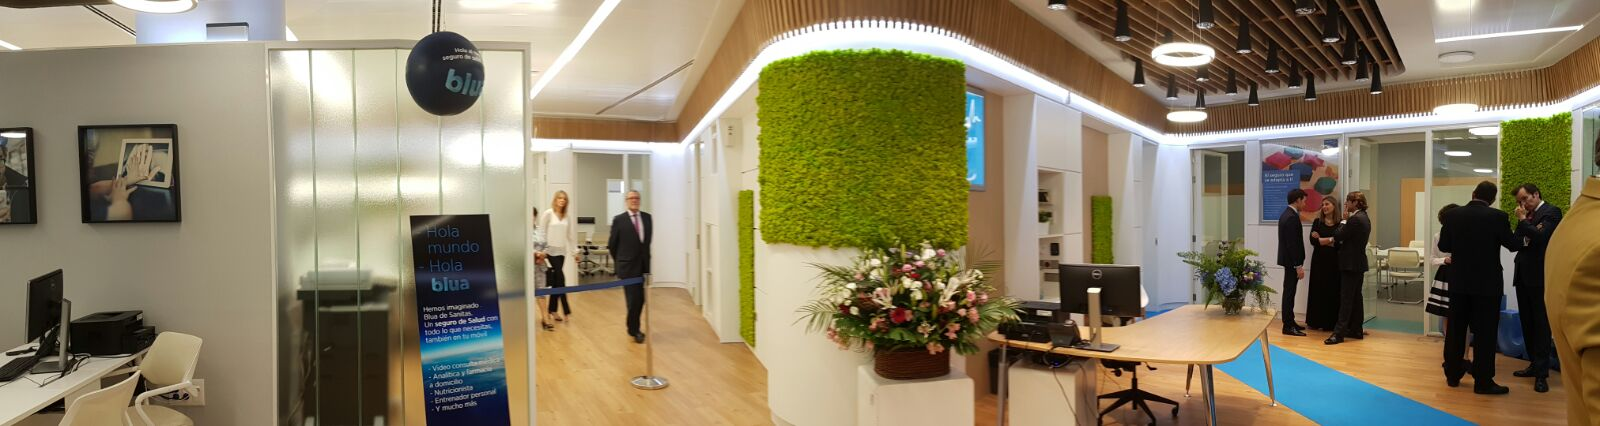 sanitas abre nueva oficina en sevilla grupo aseguranza